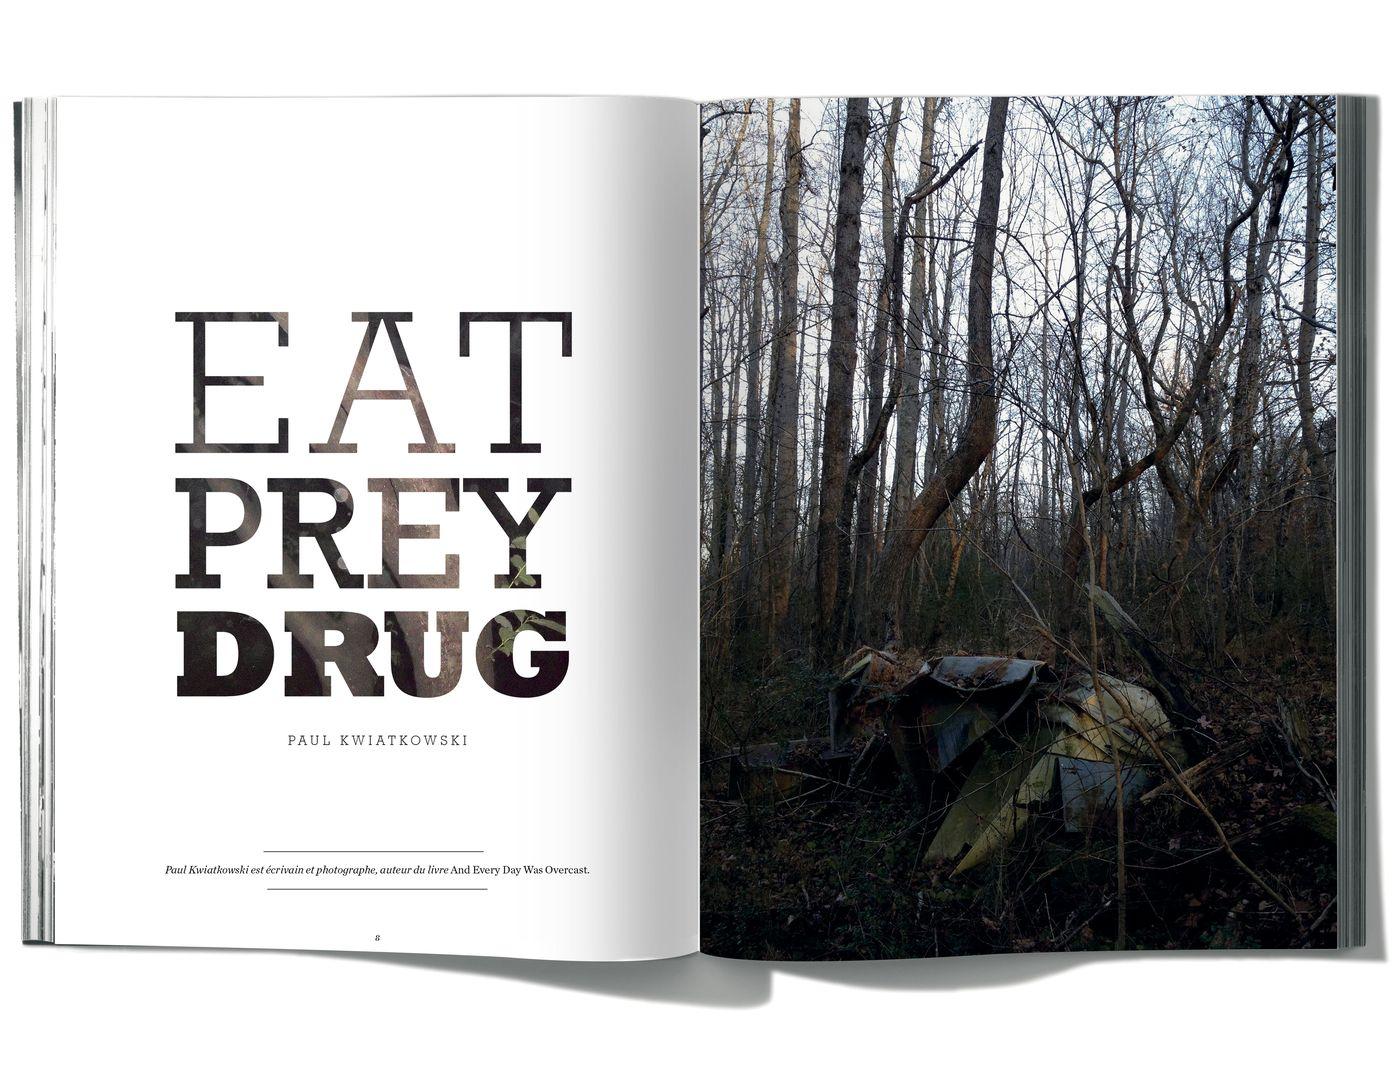 Photographies de Paul Kwiatkowski, Eat Prey Drug